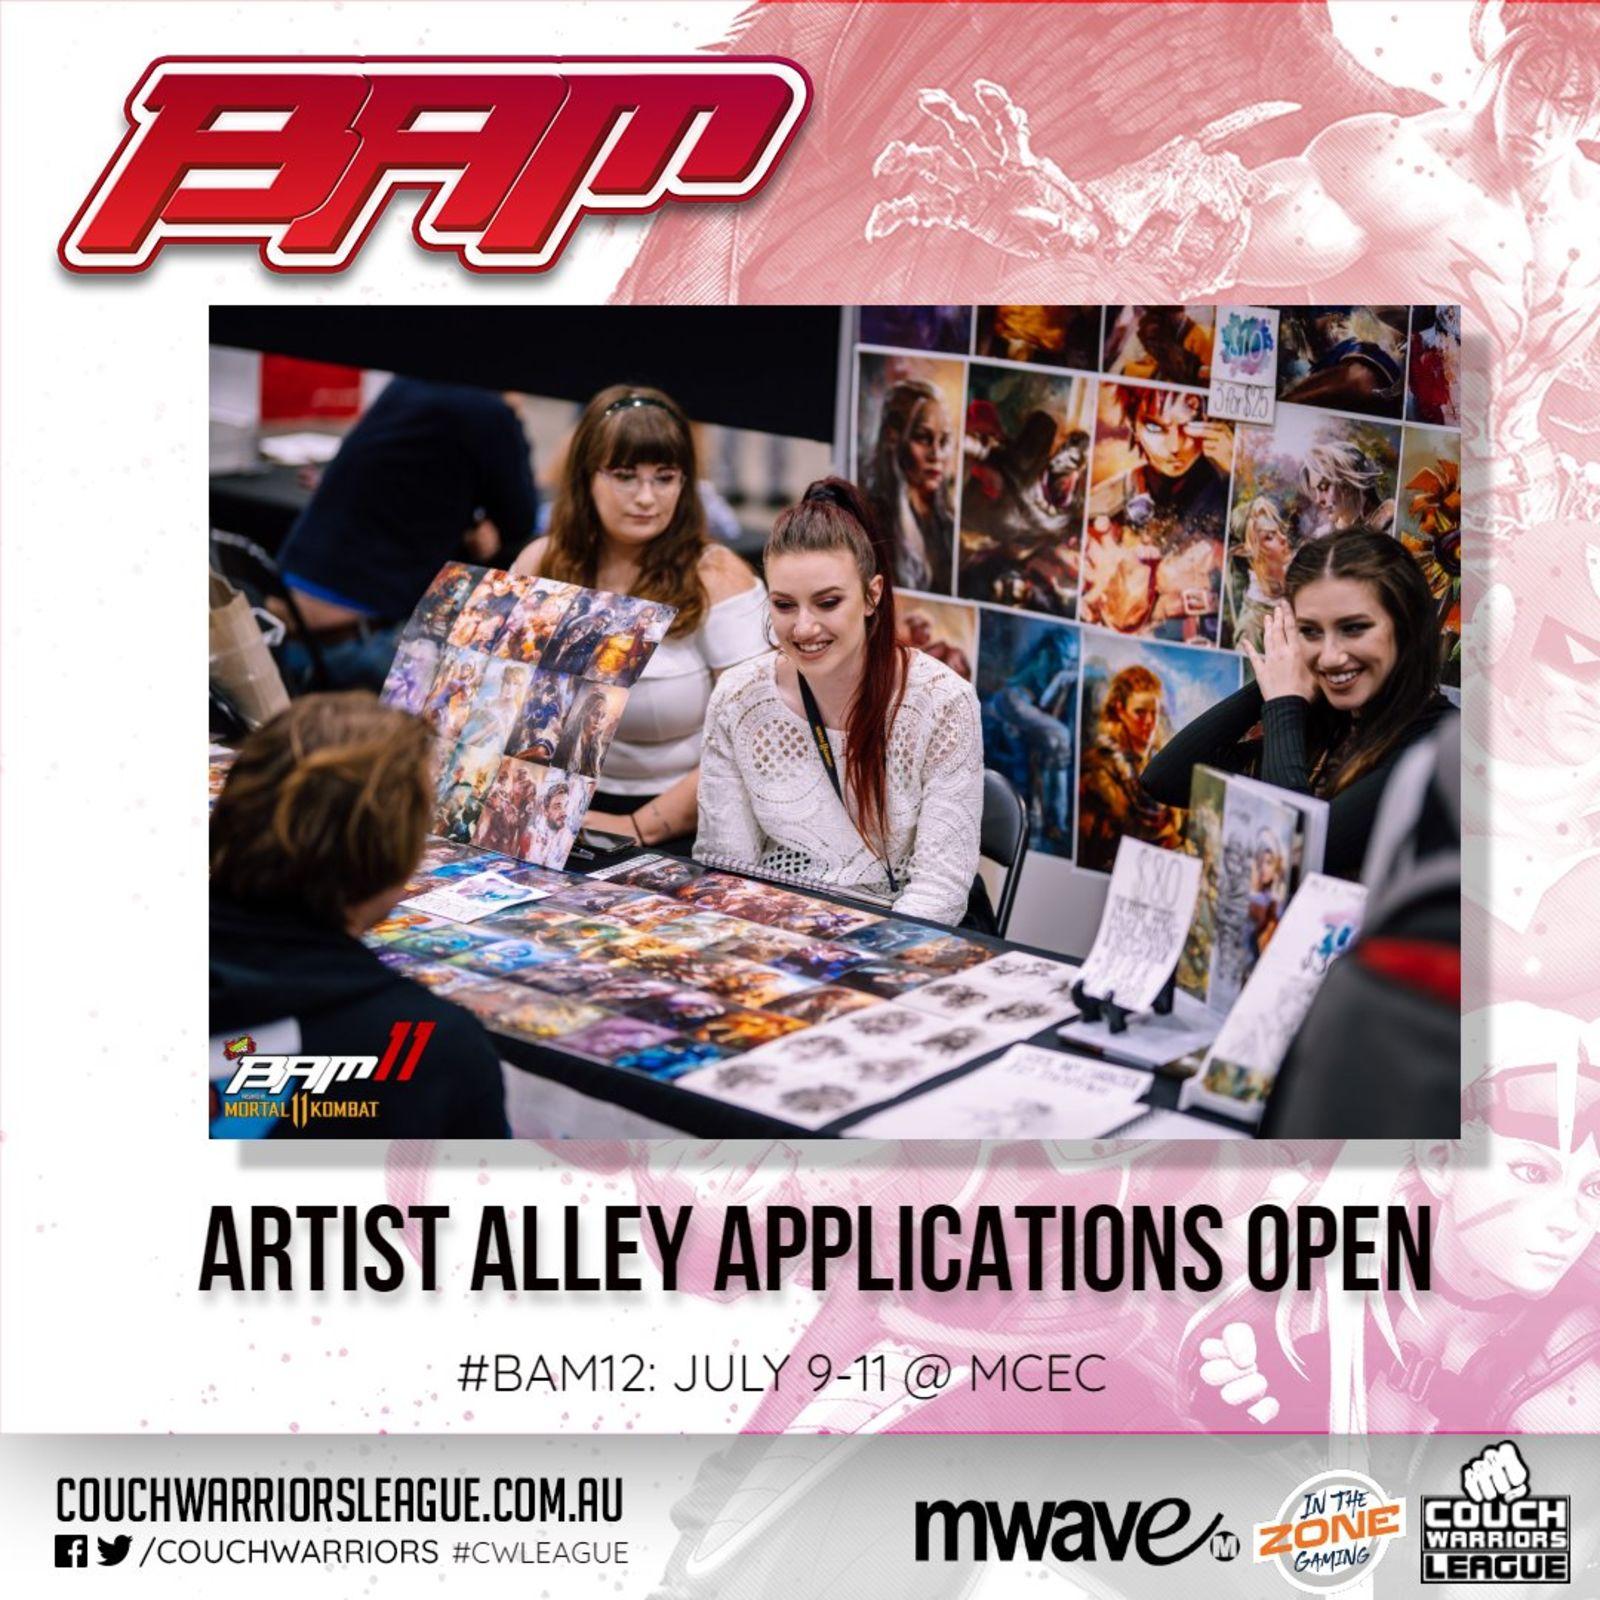 Artist's Alley announcement